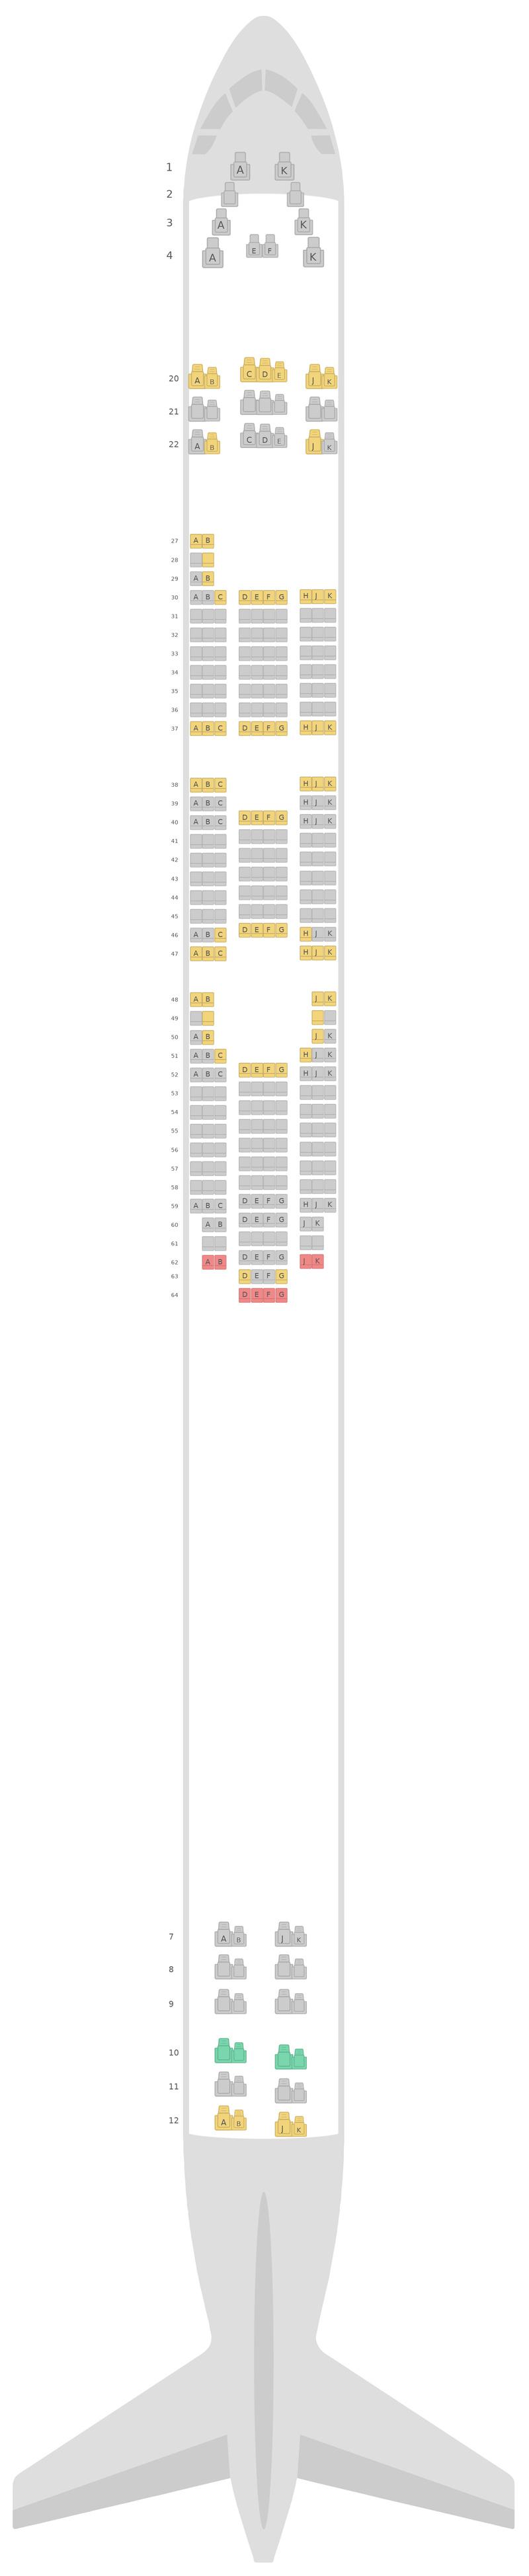 Sitzplan Boeing 747-400 (744) Asiana Airlines